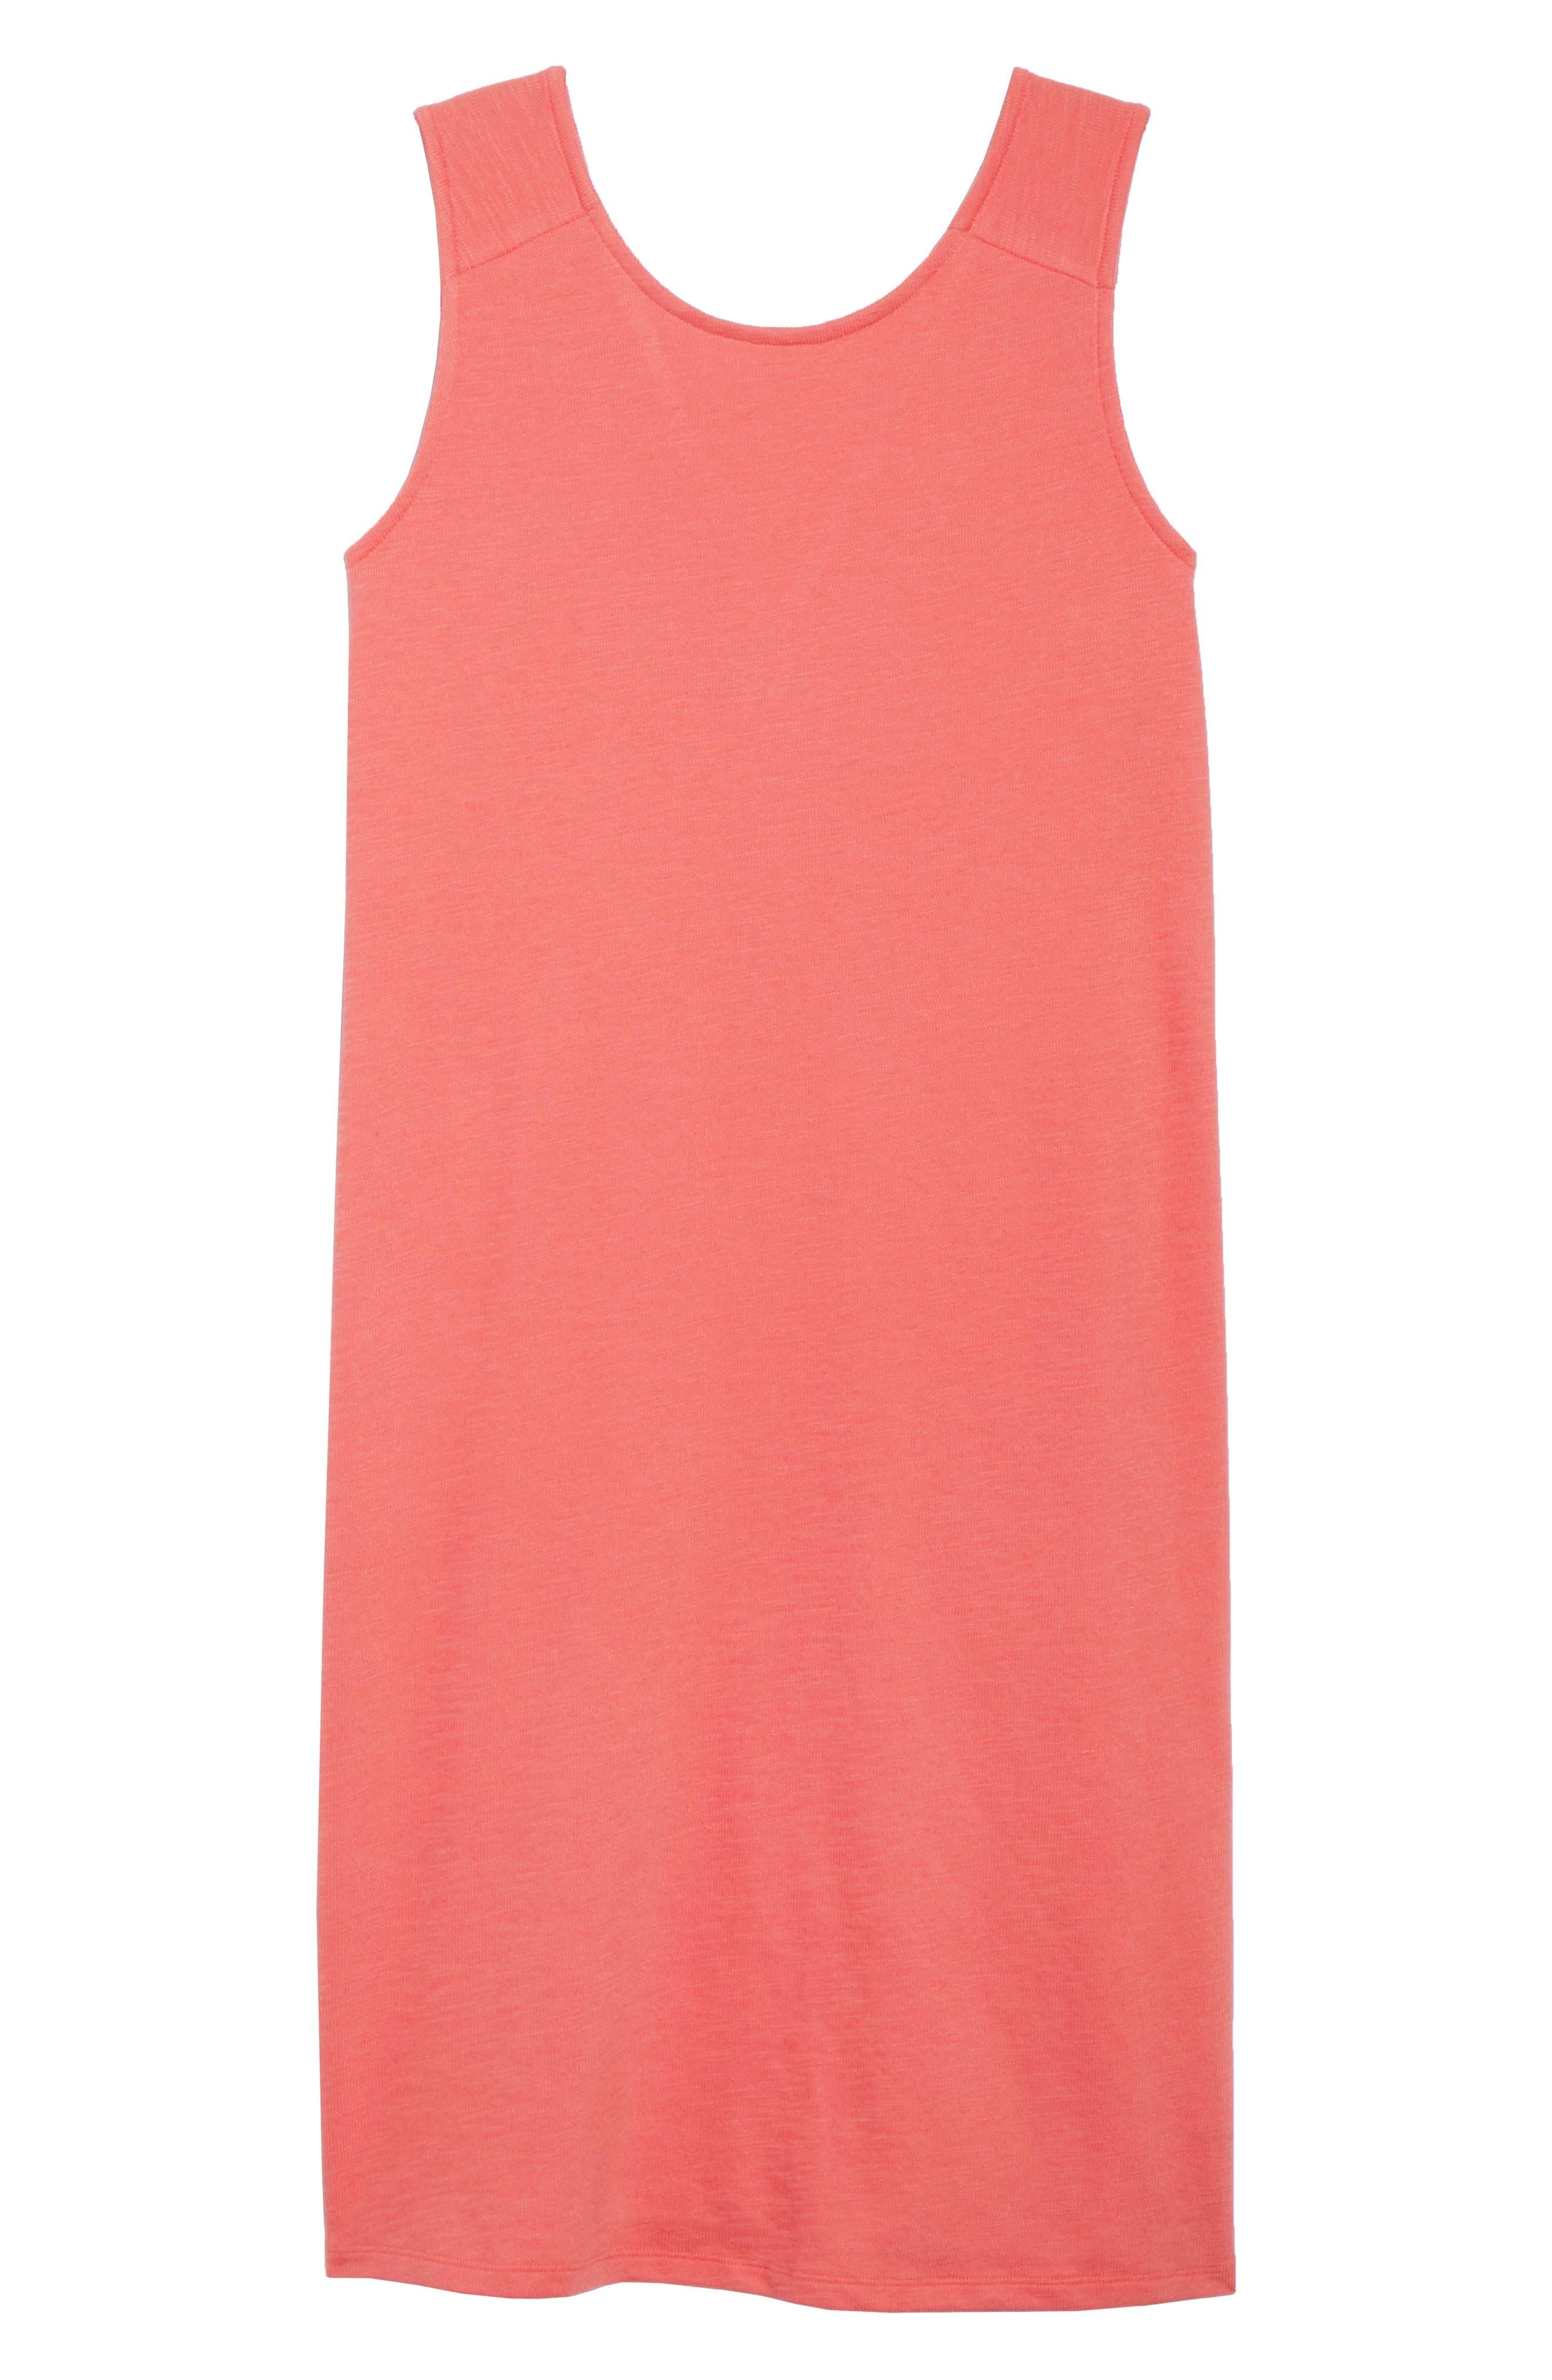 Button Back Knit Dress,                             Alternate thumbnail 7, color,                             Coral Rose